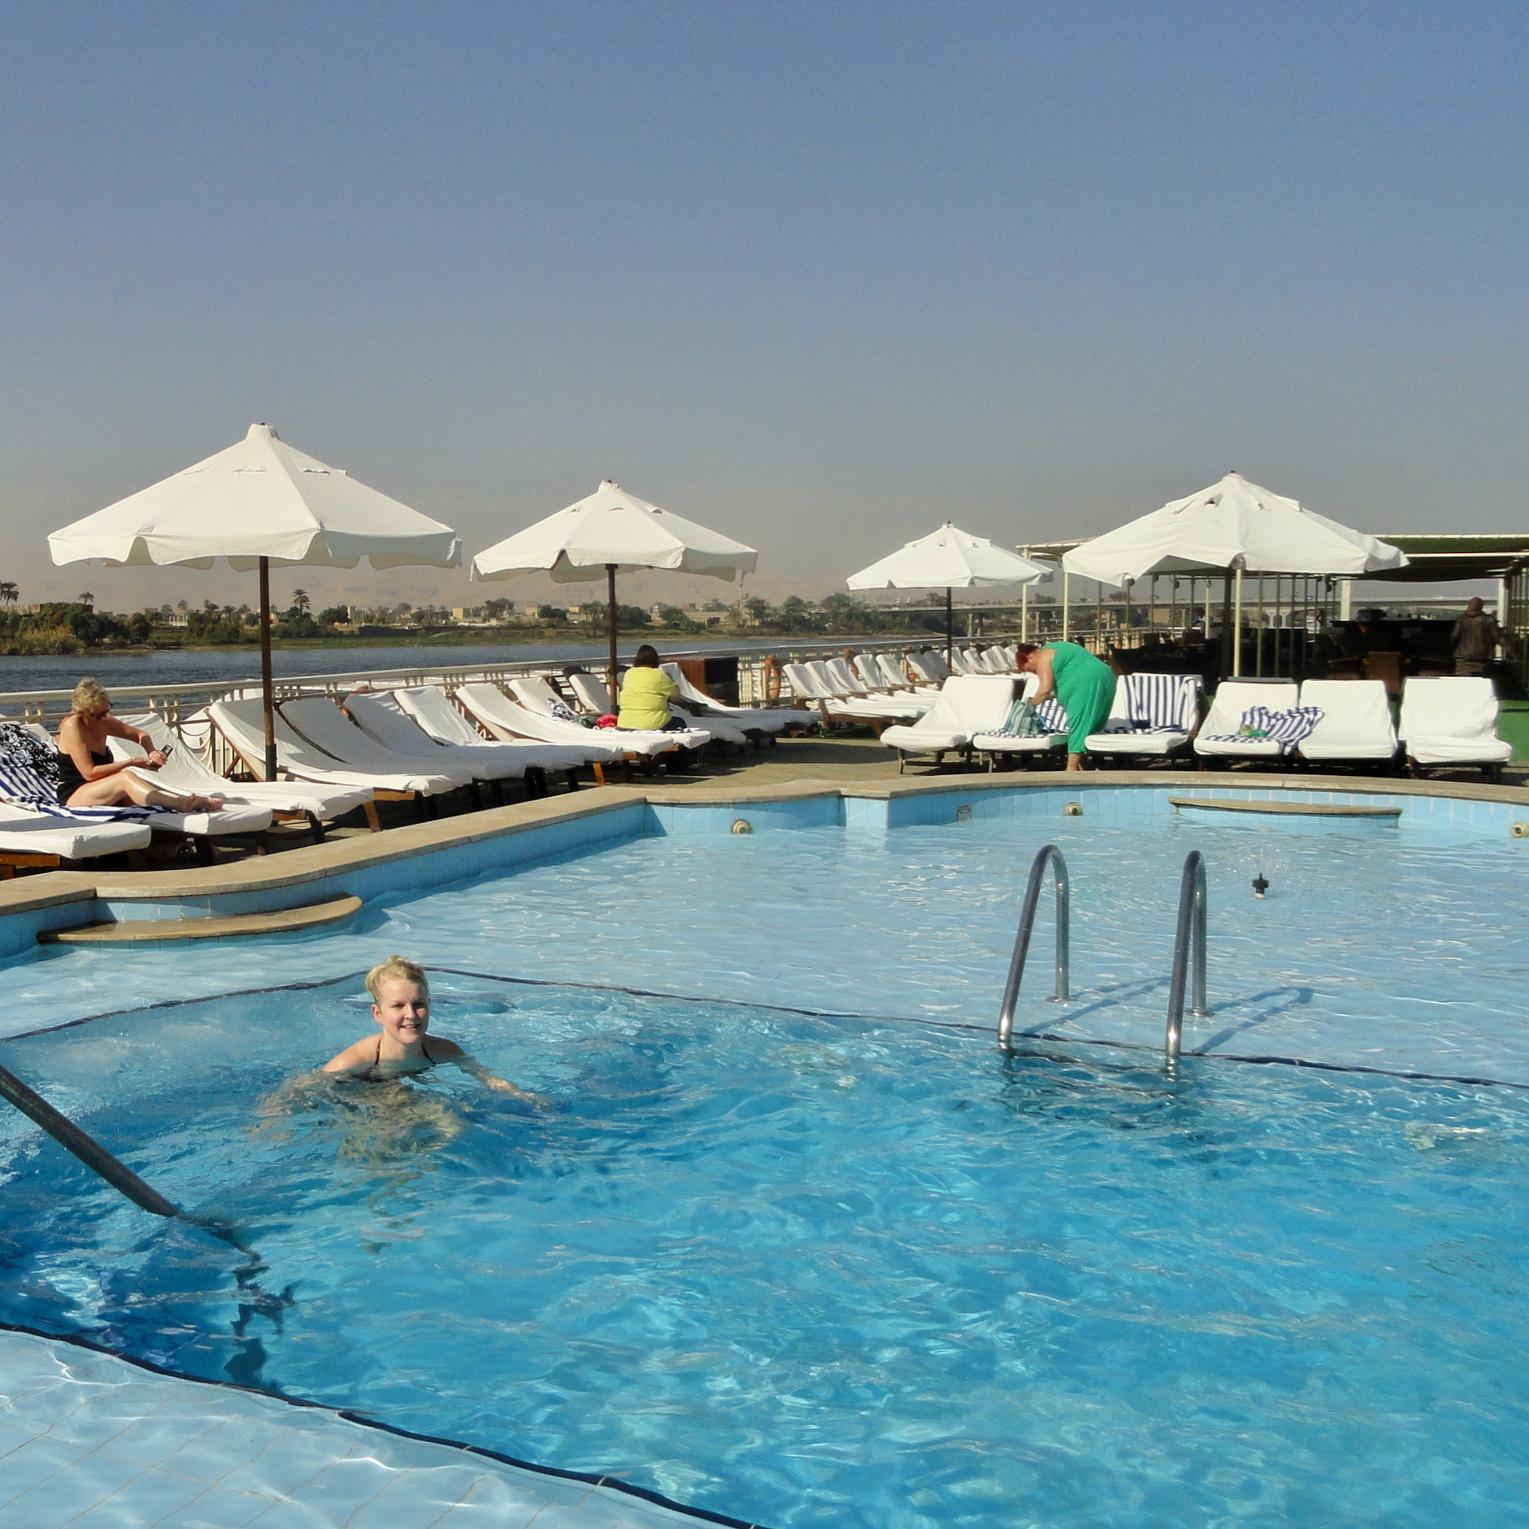 travel with kids children experiences travel tips leni egypt nile cruise